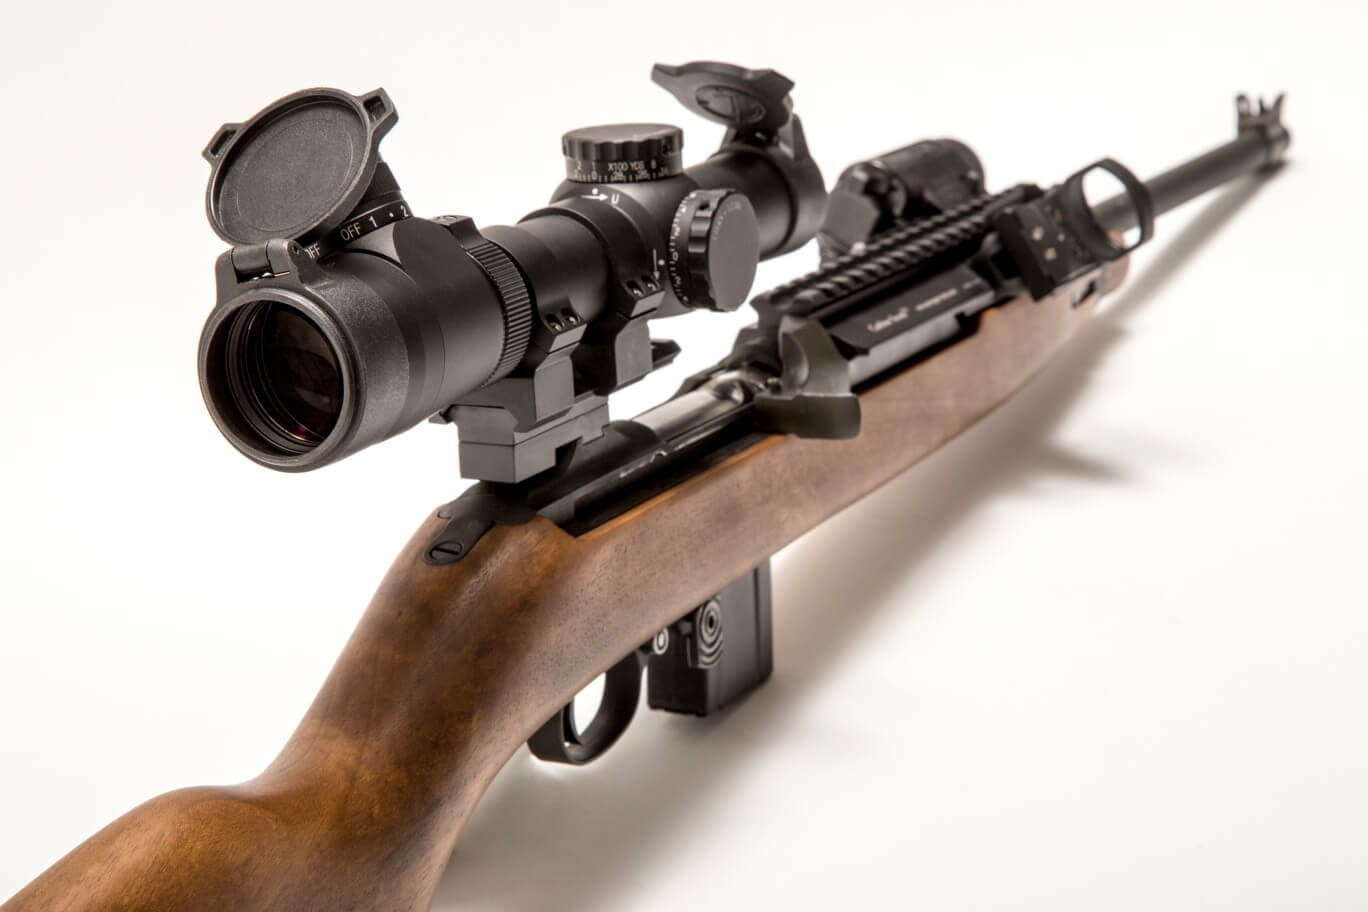 Auto Ordnance M1 Carbine - Auto-Ordnance | Original